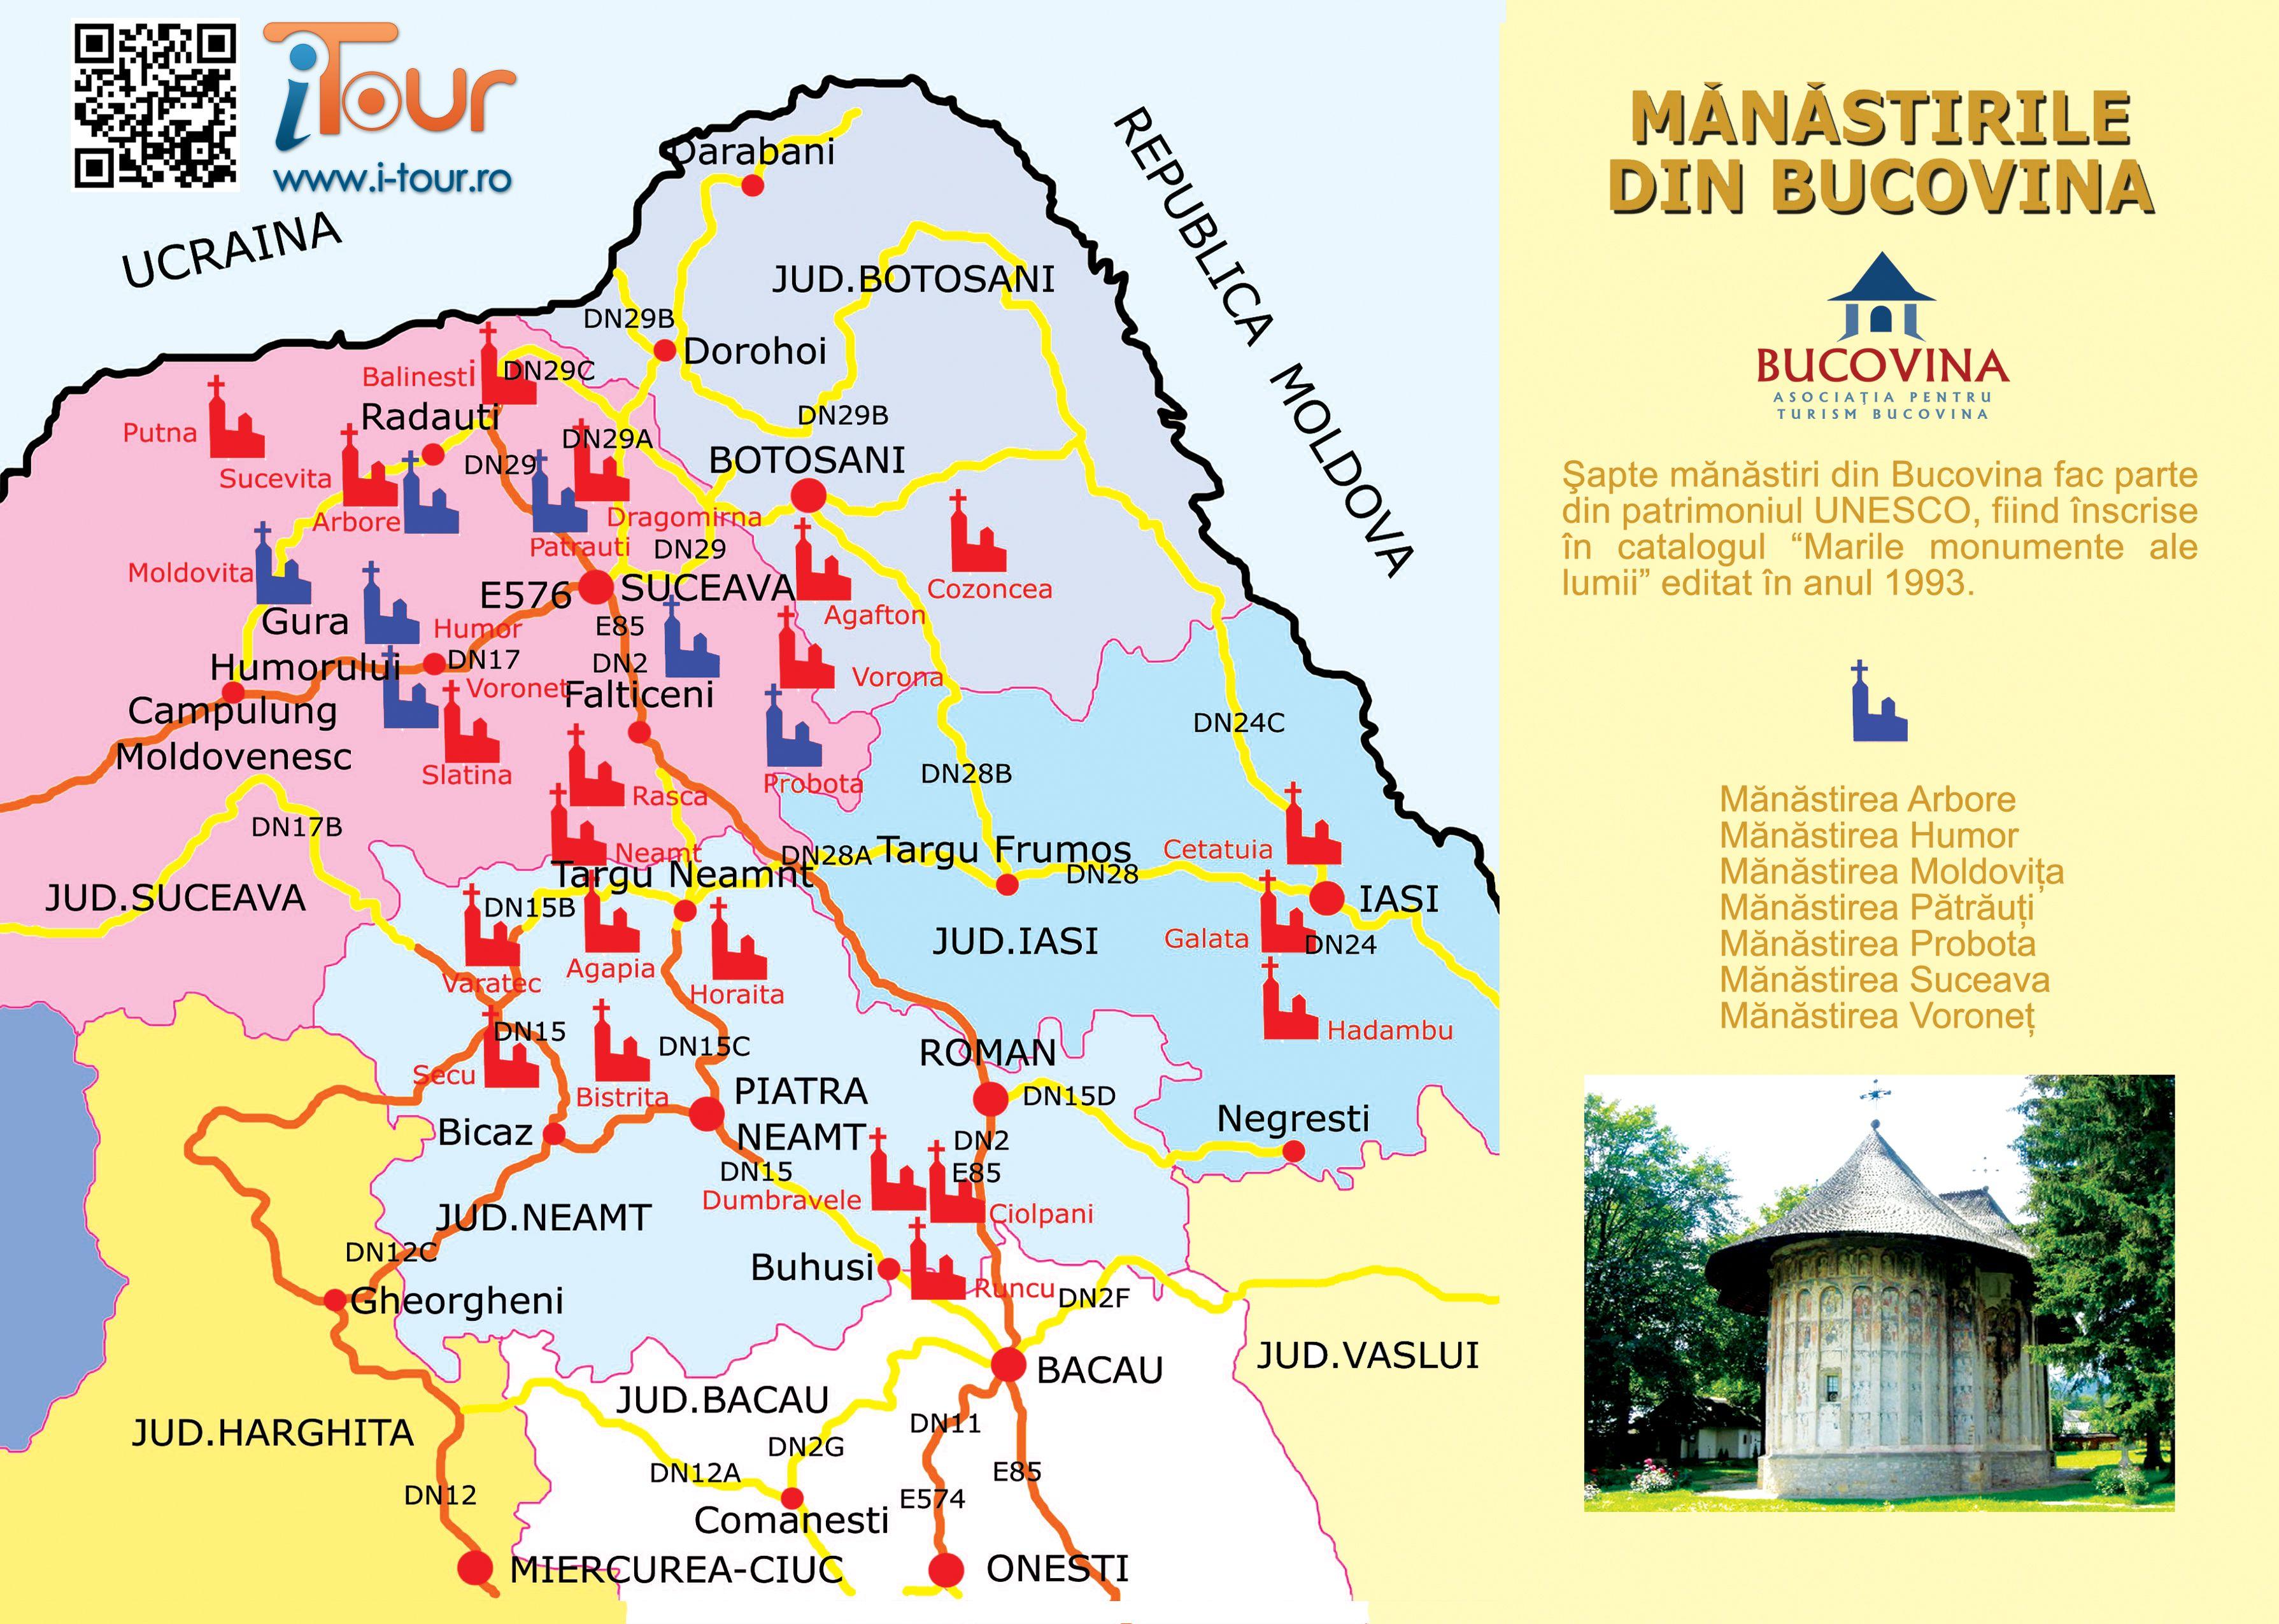 Harta Manastirilor Din Bucovina Monasteries Of Bucovina